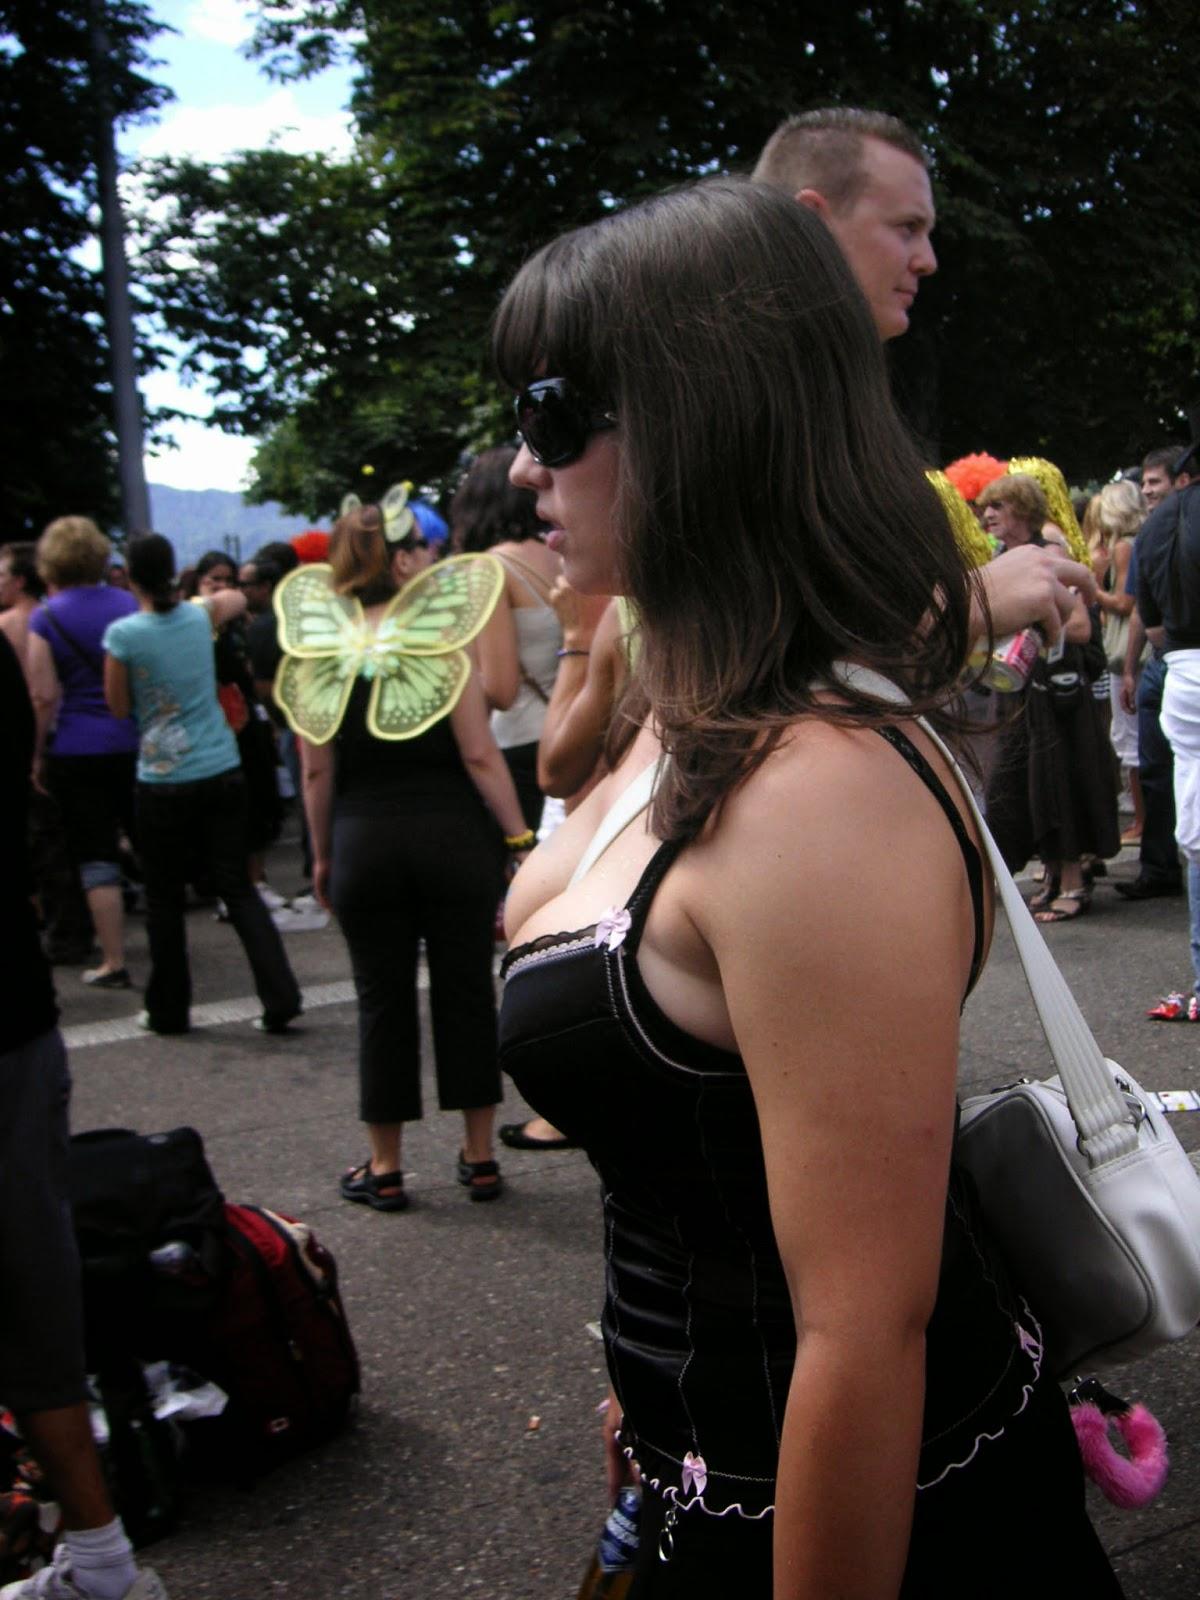 En la calle minifalda ajustada negra de una rica nalgona - 5 10